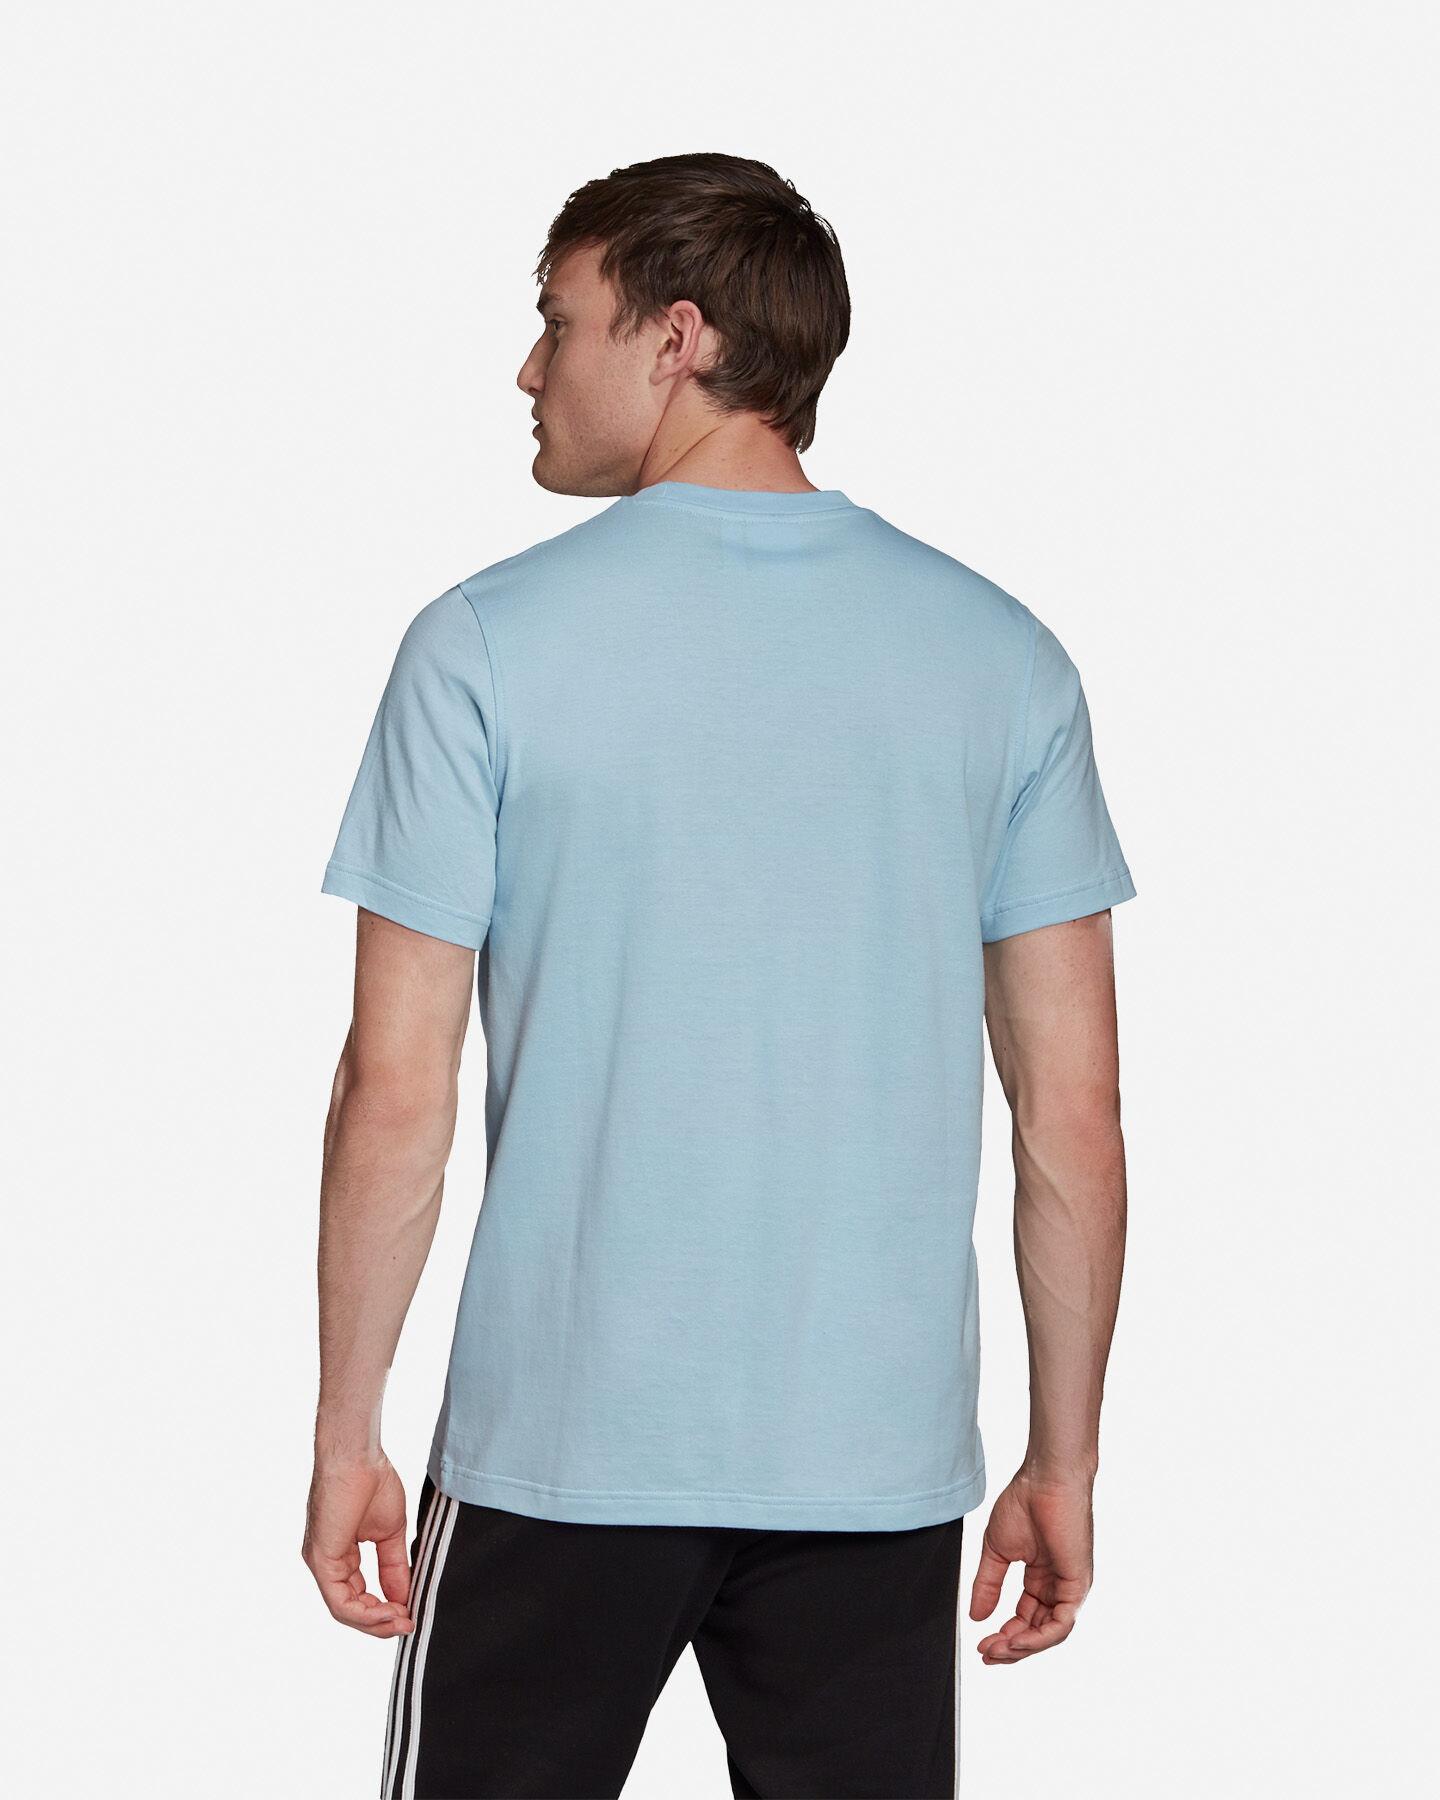 T-Shirt ADIDAS TREFOIL ADICOLOR M S5148483 scatto 4